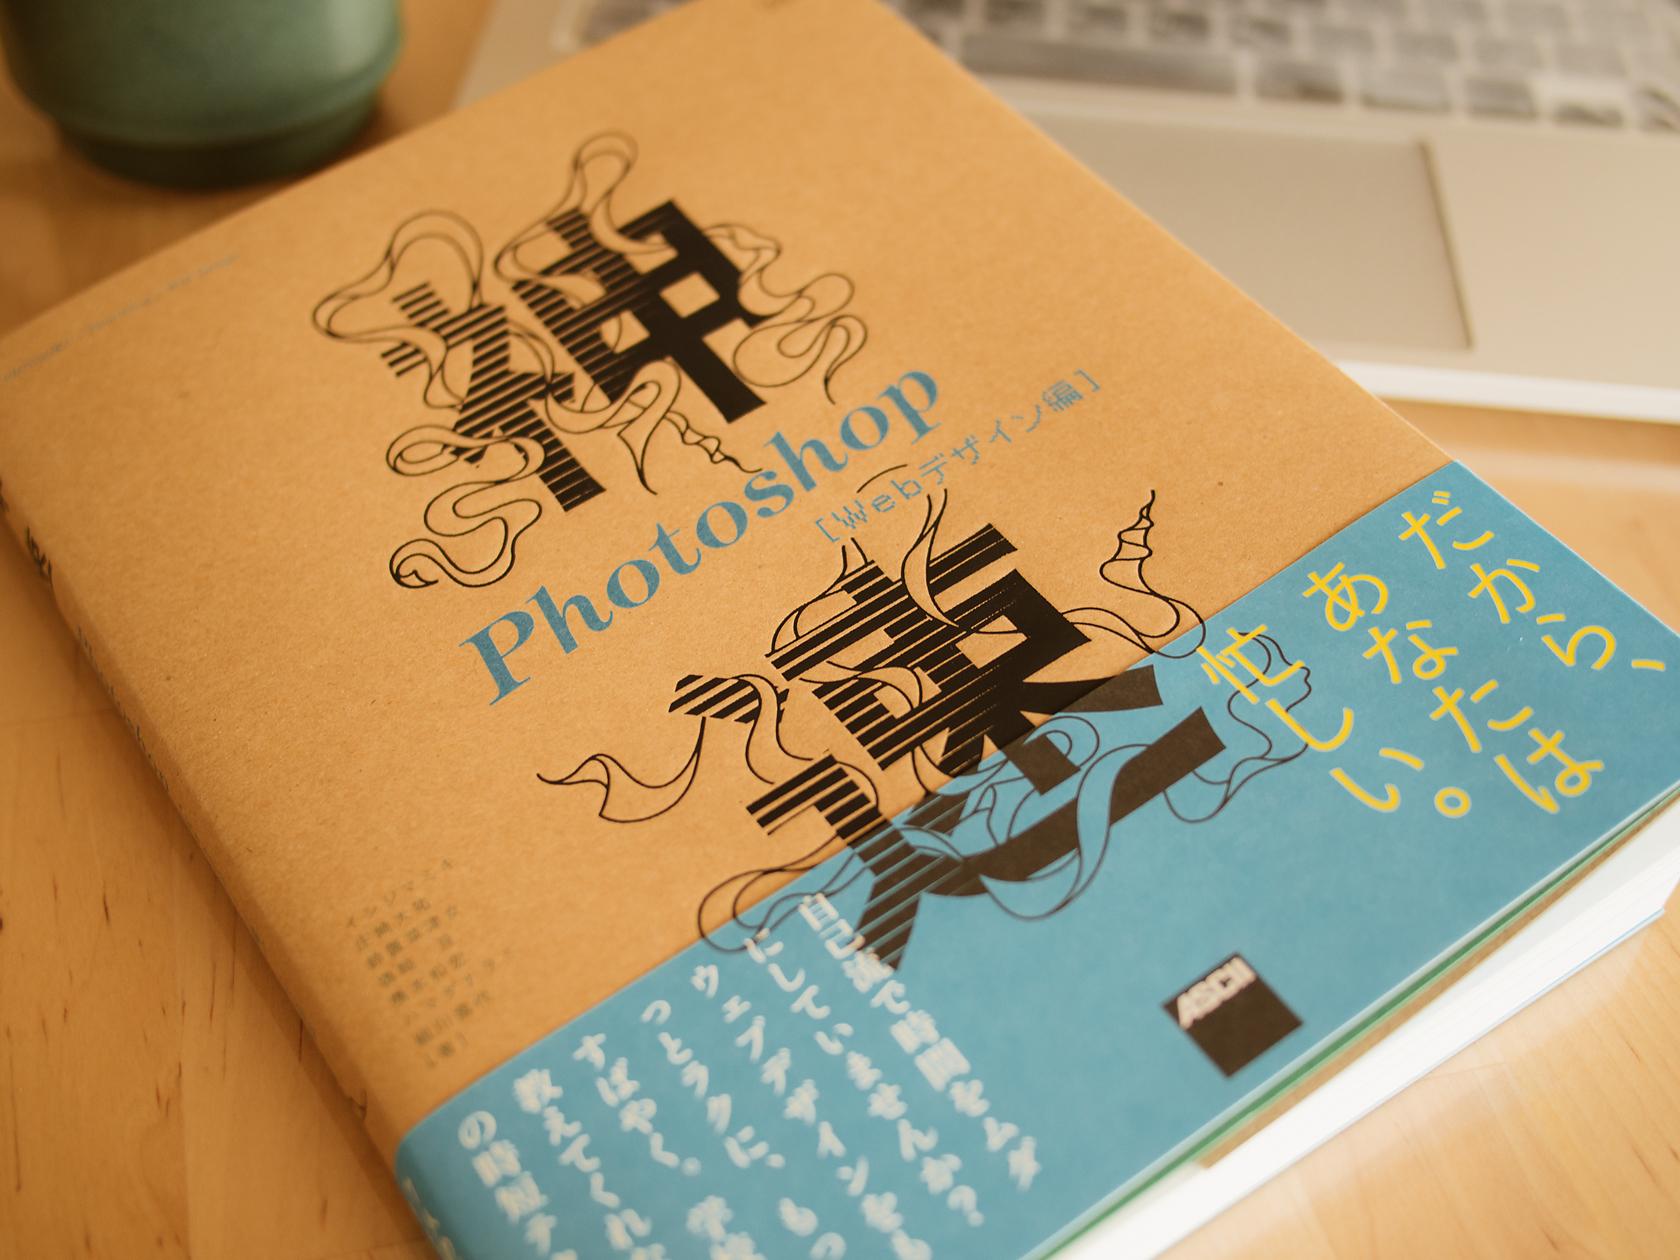 psbook2_1.jpg